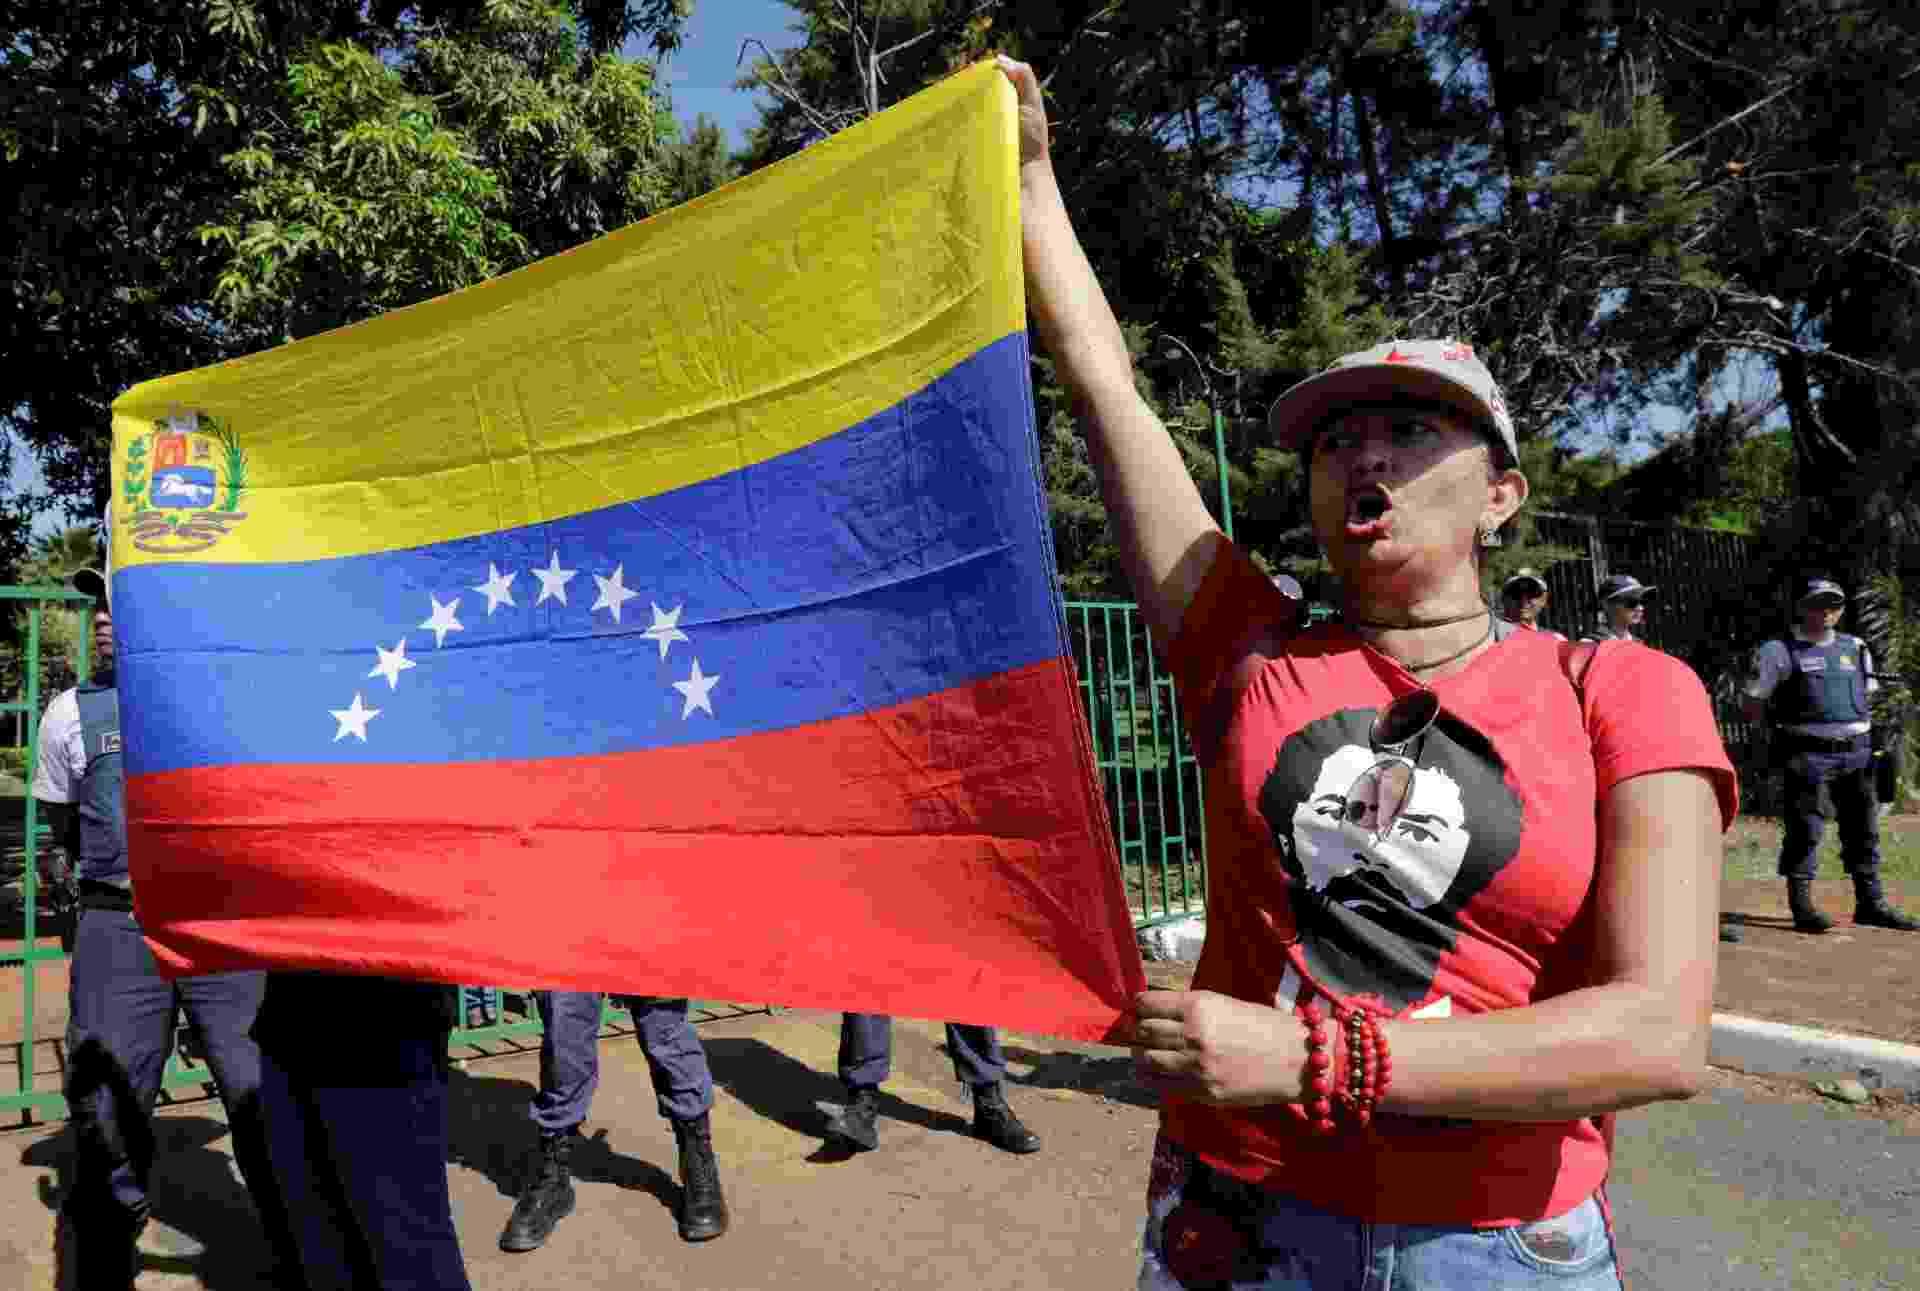 Manifestantes seguram bandeira da Venezuela - SERGIO MORAES/REUTERS